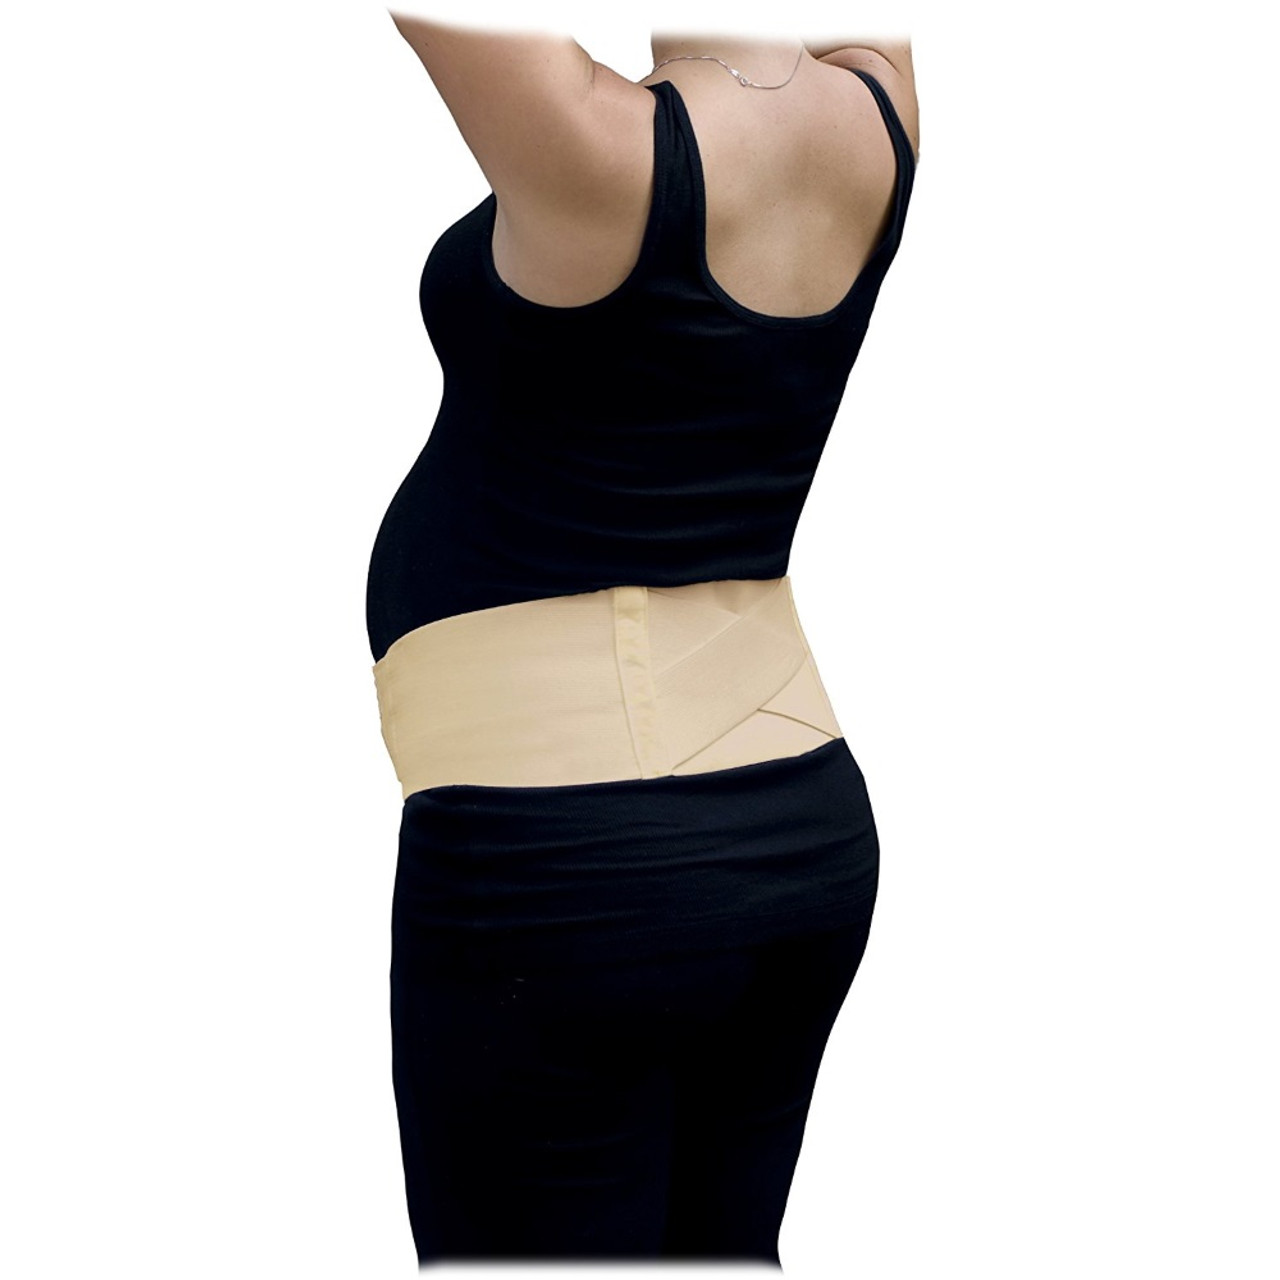 Jolly Jumper Maternity Support Belt Tan